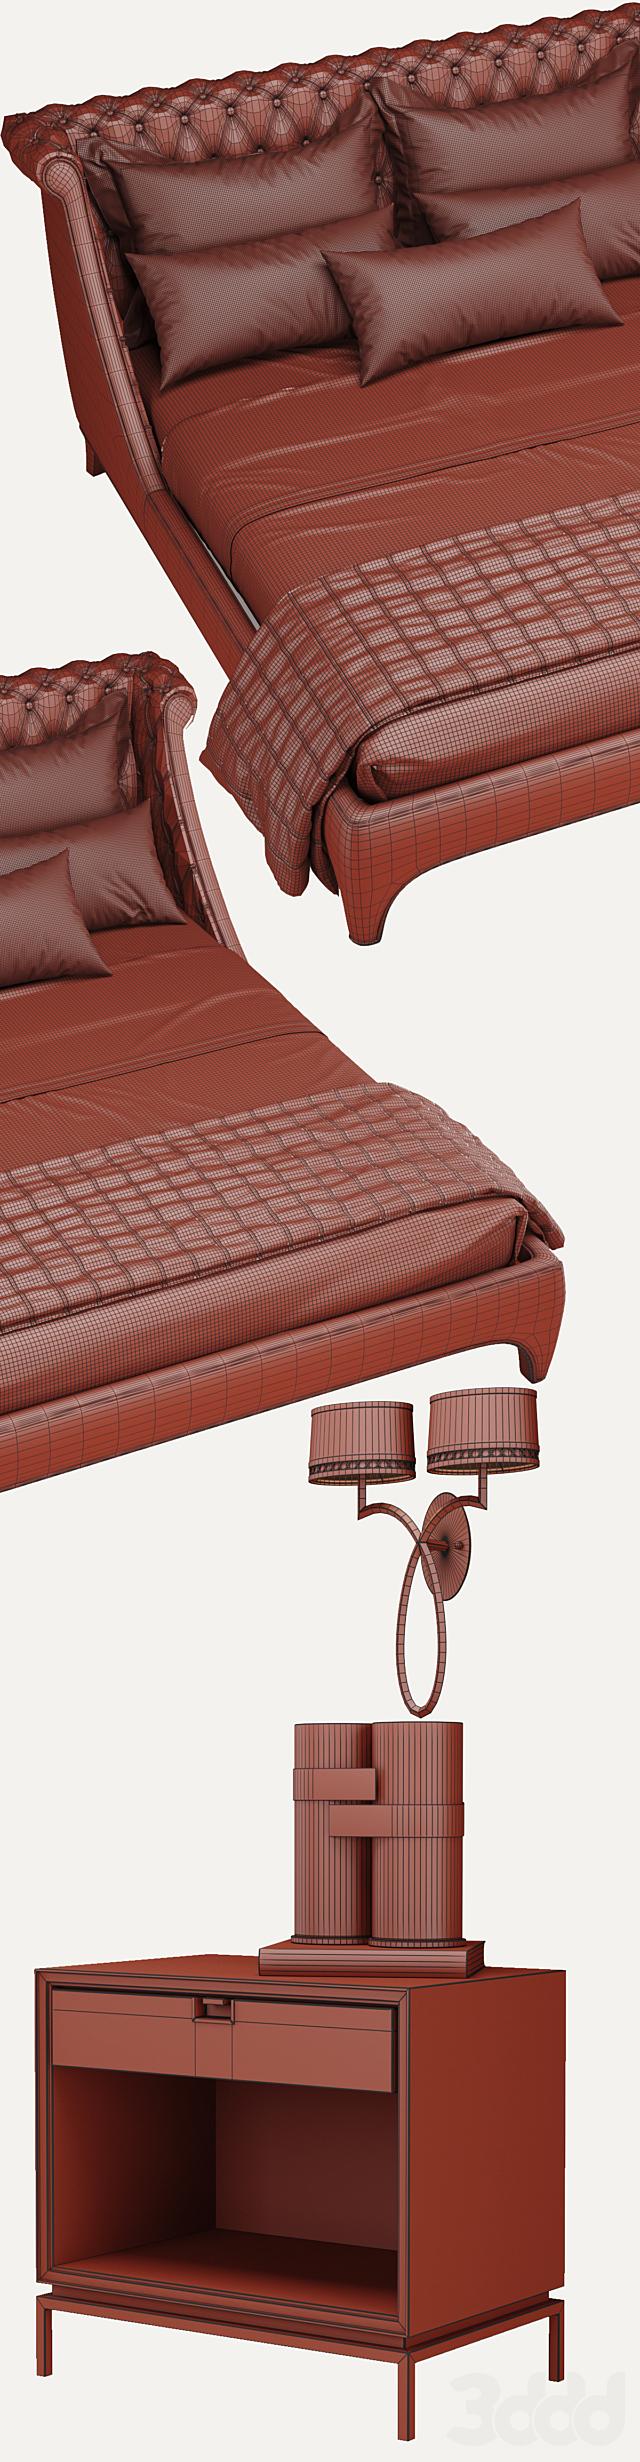 Bradmore Bed - Gianfranco Ferrè Home